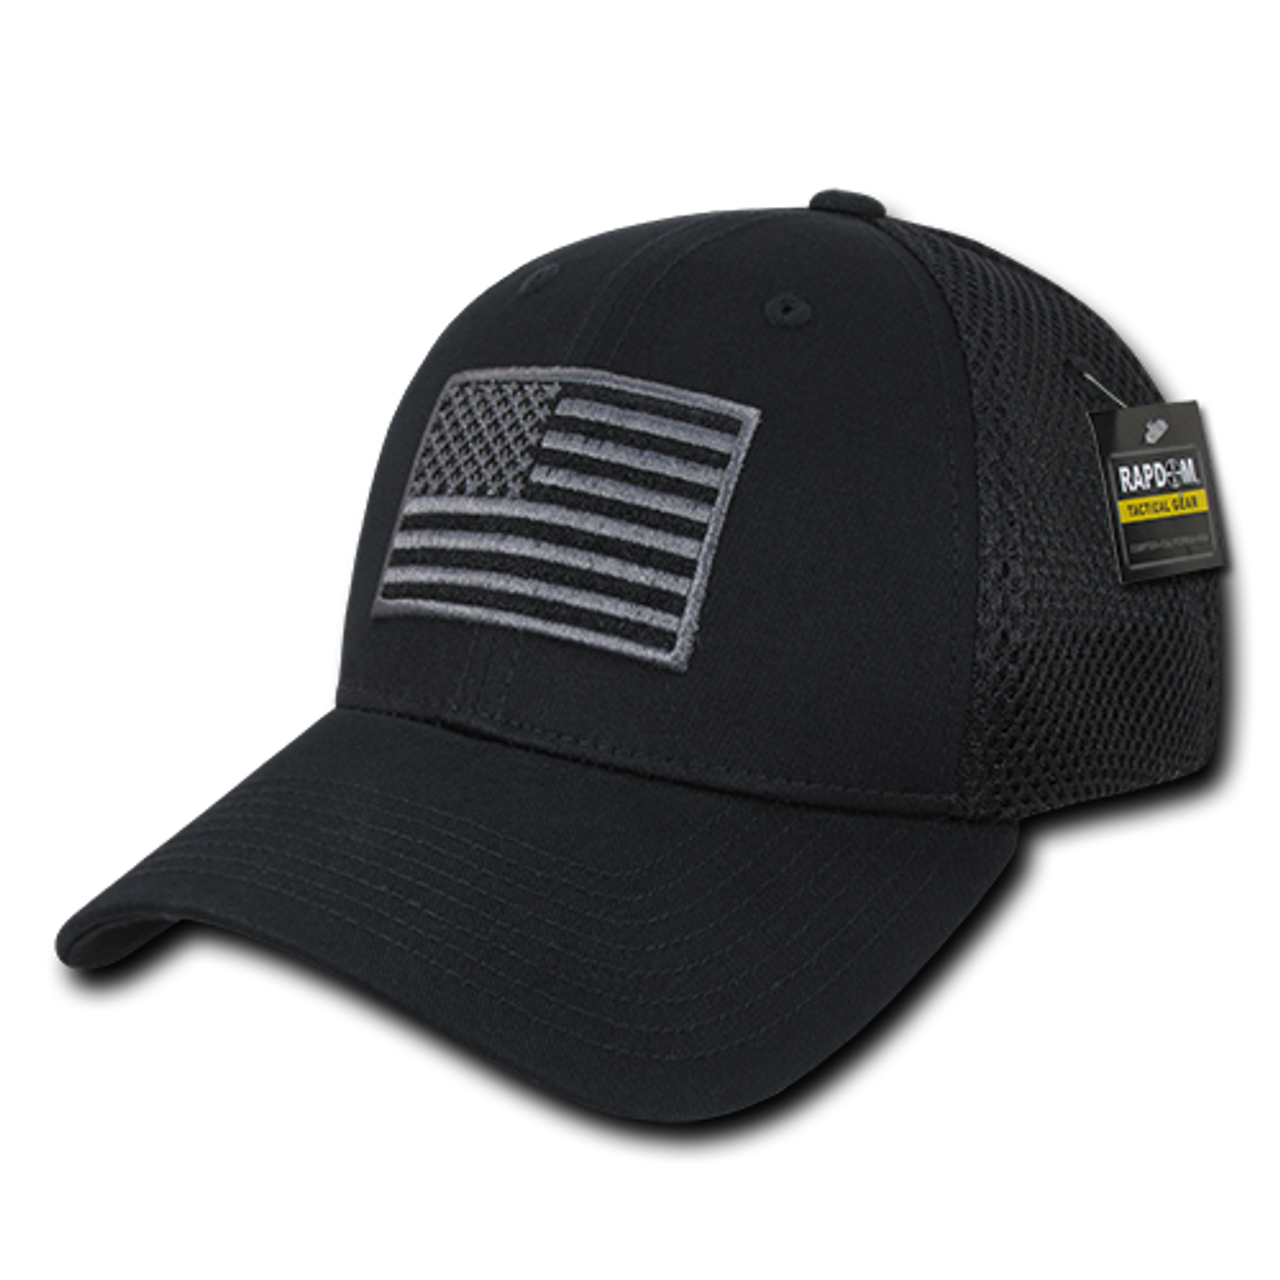 US Submarine Service Veteran Embroidered Patch Snapback Baseball Cap